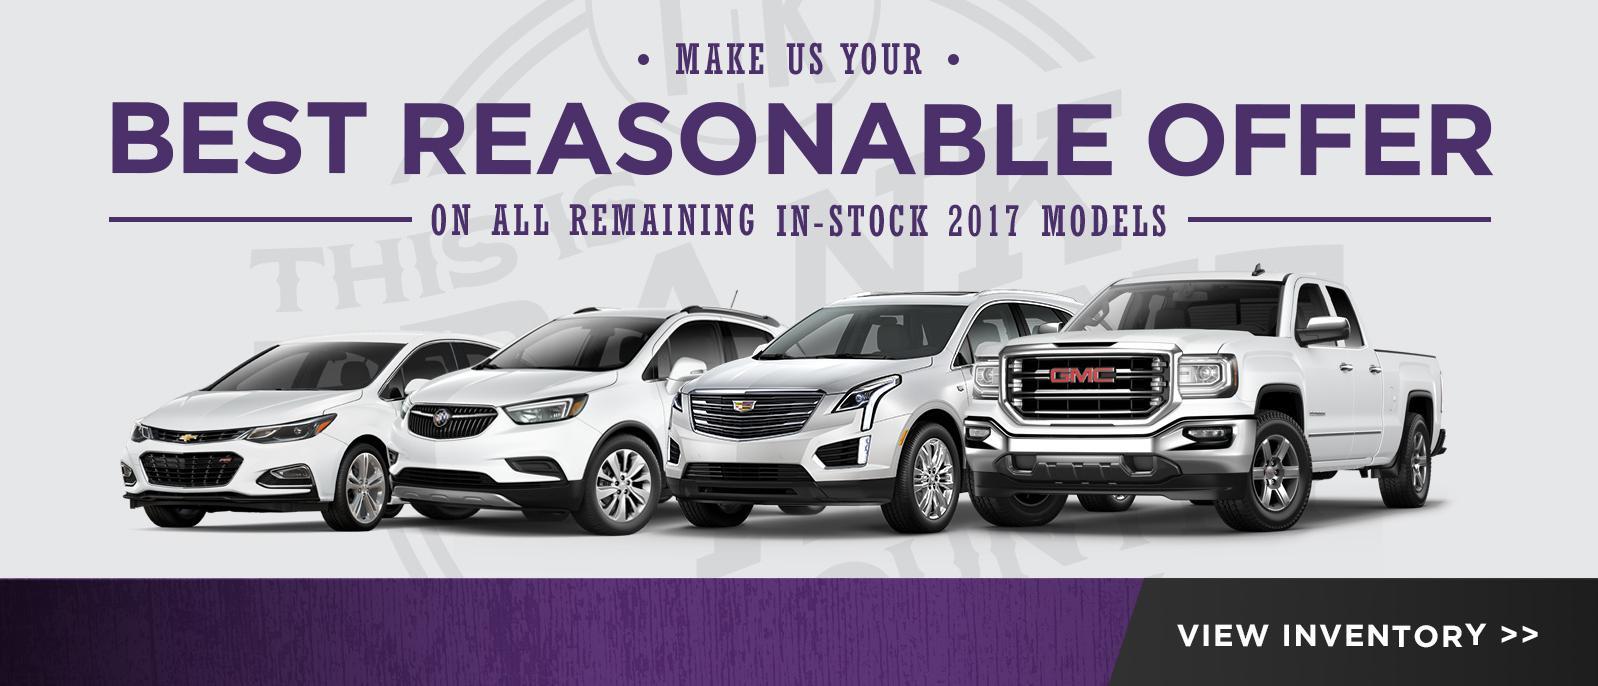 Frank Kent Hyundai, Frank Kent Fort Worth, Frank Kent Genesis, Frank Kent  Cadillac Fort Worth, Tx, Hyundai Dealership Fort Worth, Allen Samuels  Hyundai, ...